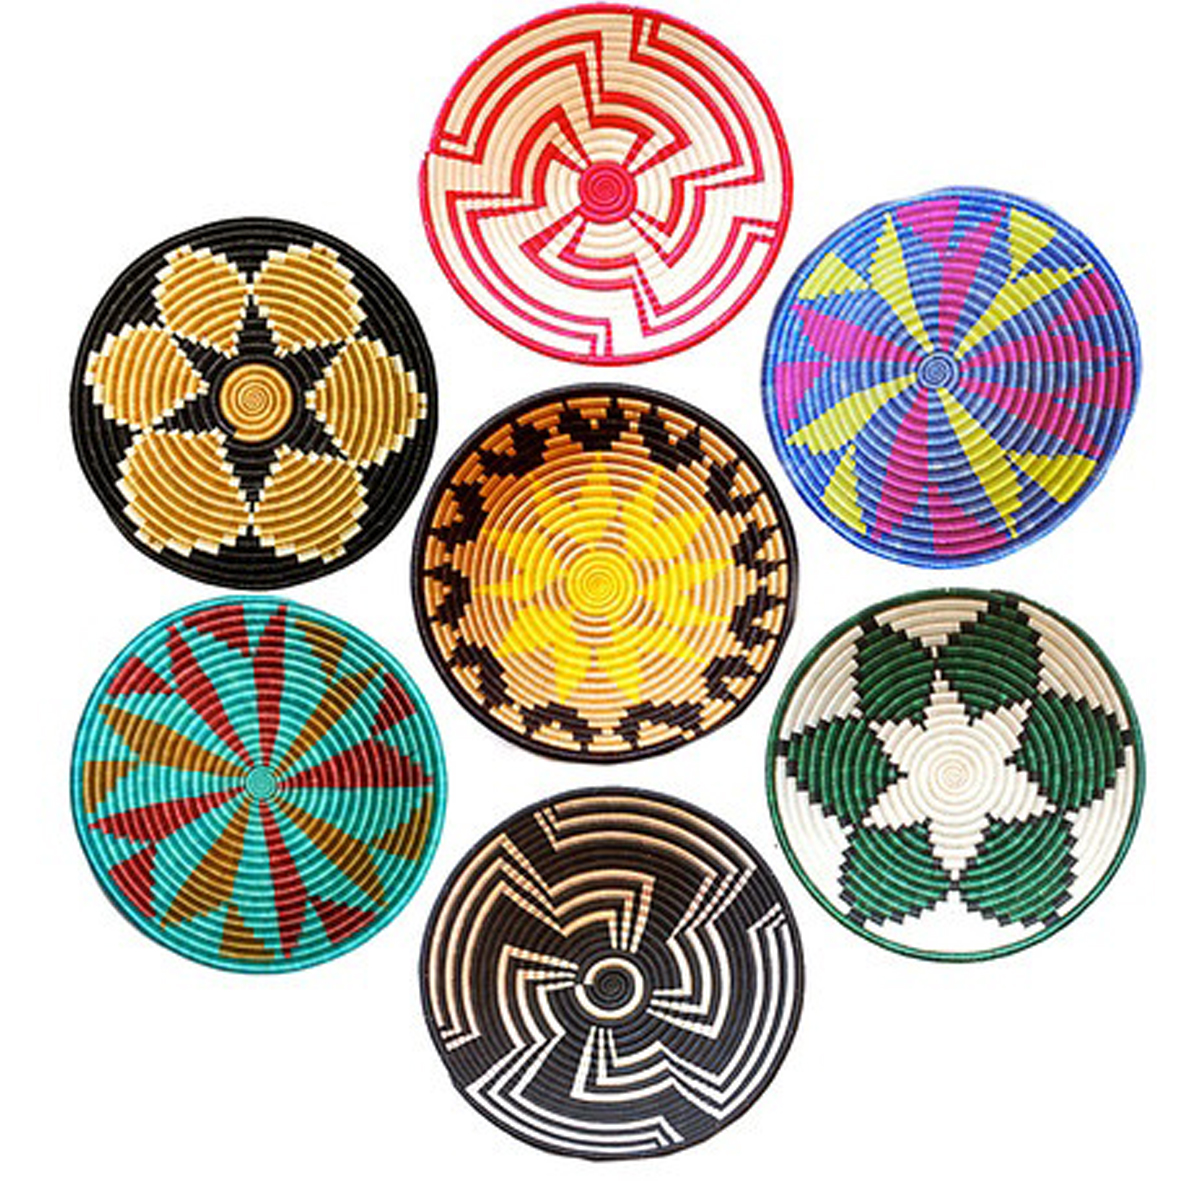 Basket Weaving Groups : Iheartprintsandpatterns african basket weaving